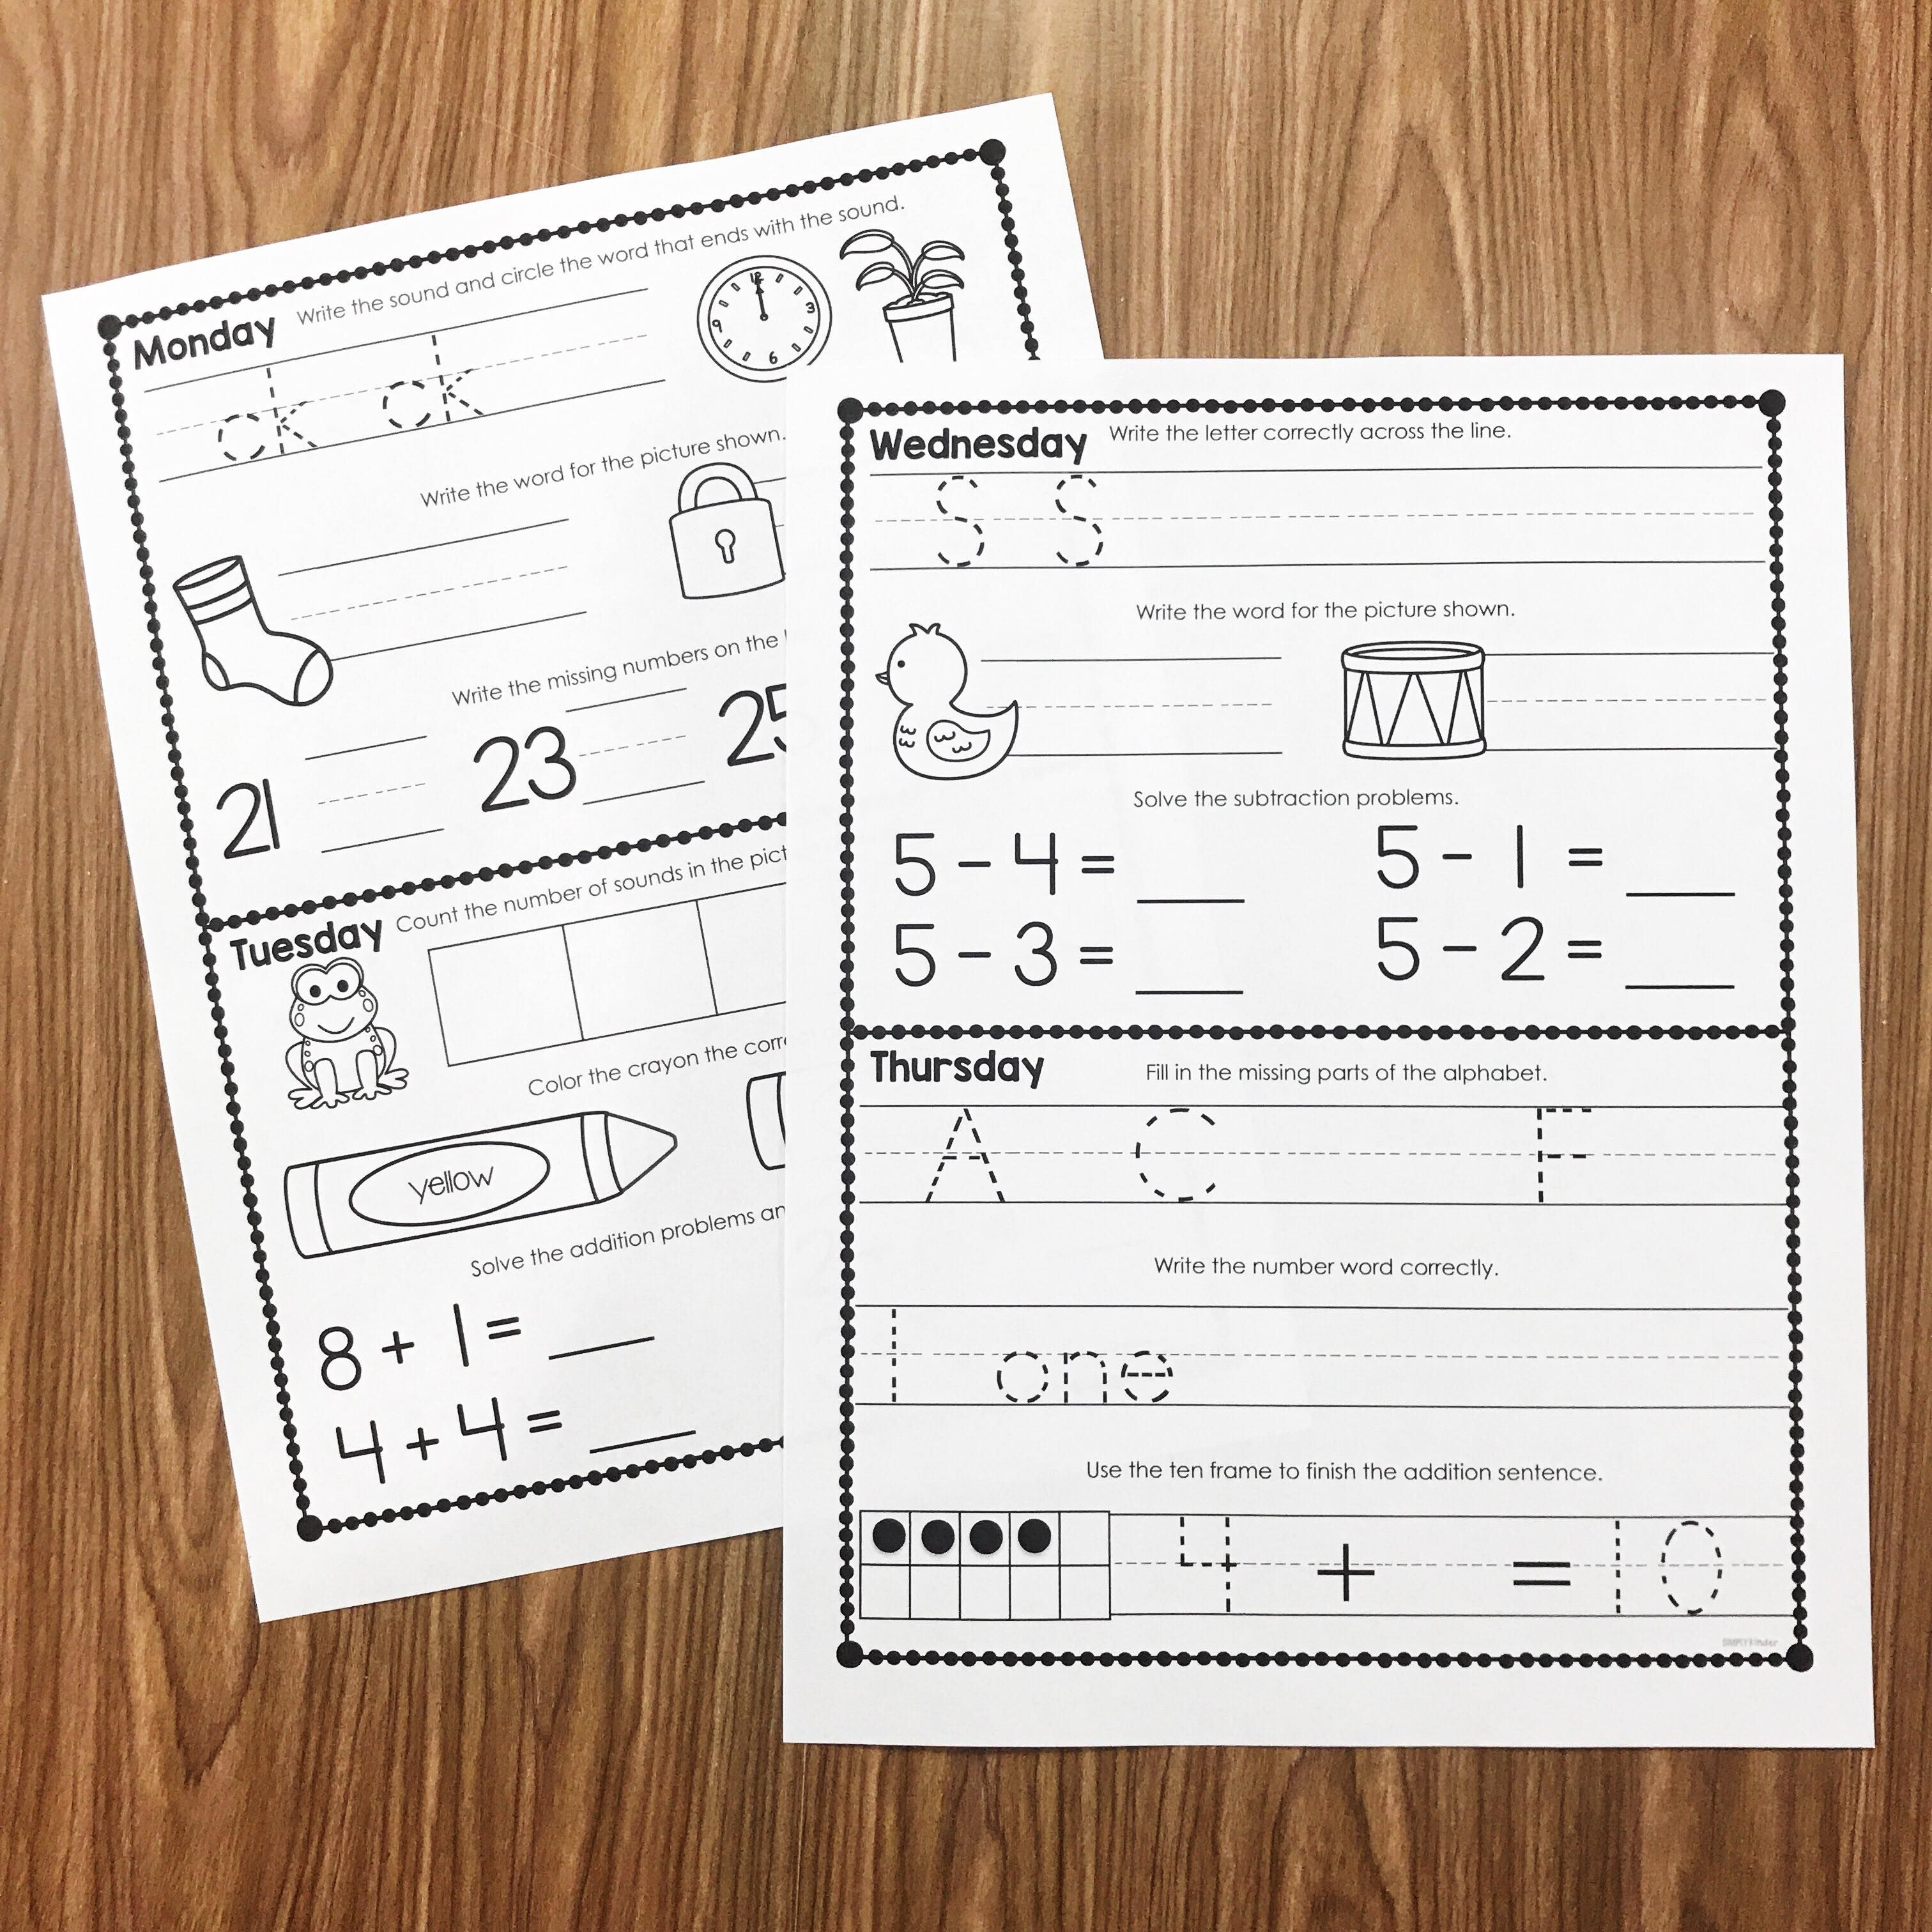 Kindergarten Homework Fourth Quarter Simply Kinder Kindergarten Homework Teaching Calendar Kindergarten [ 3024 x 3024 Pixel ]